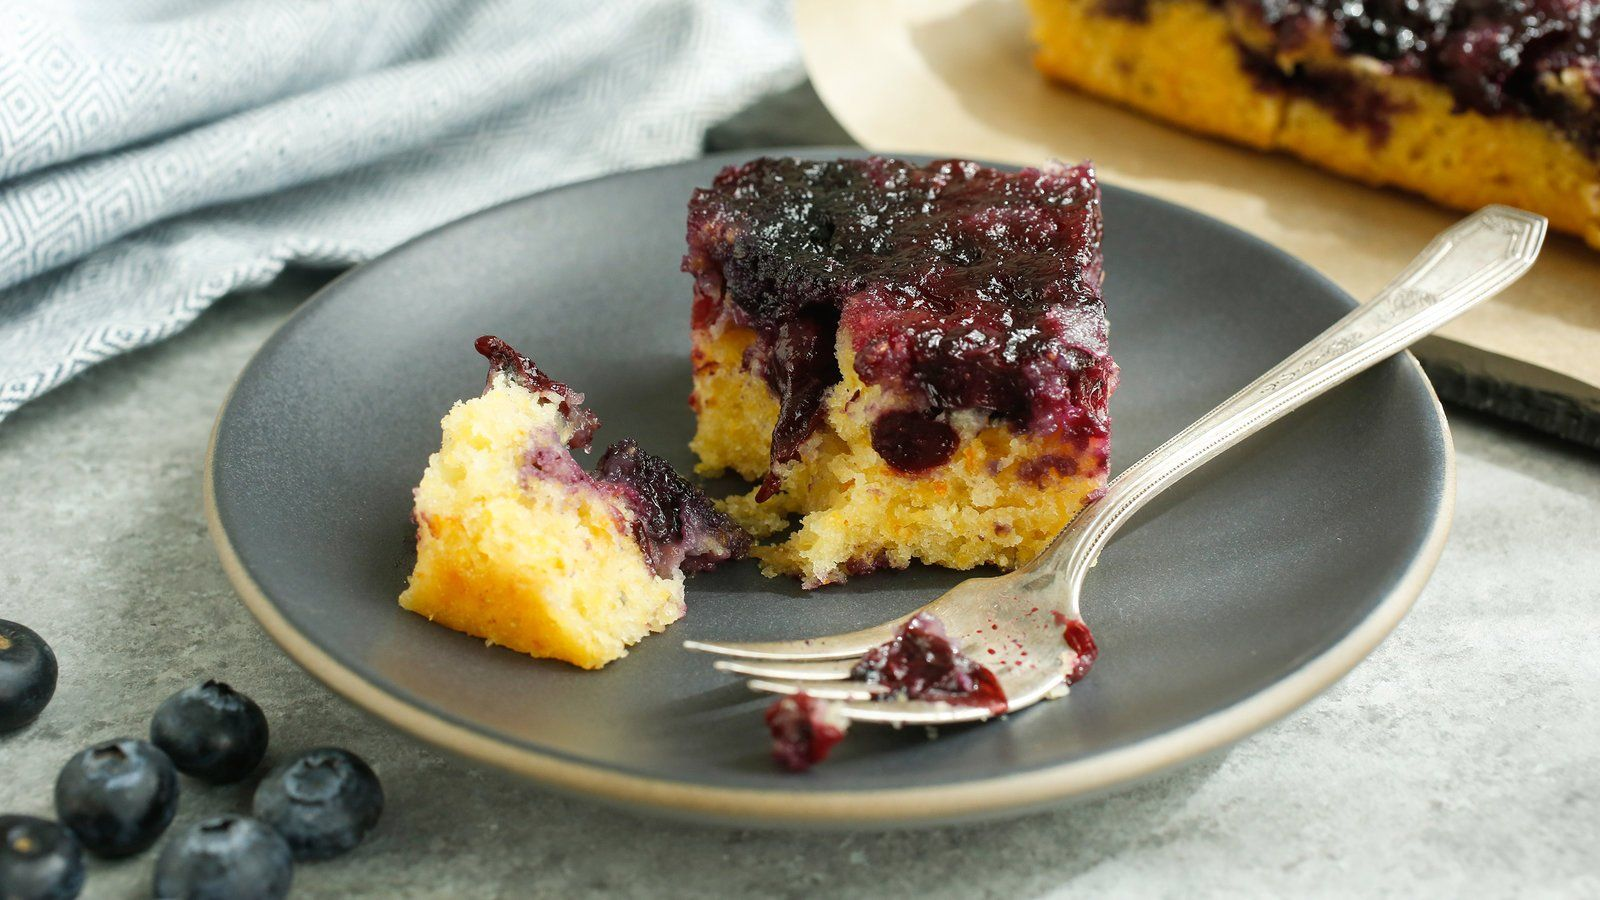 Blueberry polenta upsidedown cake recipe recipe